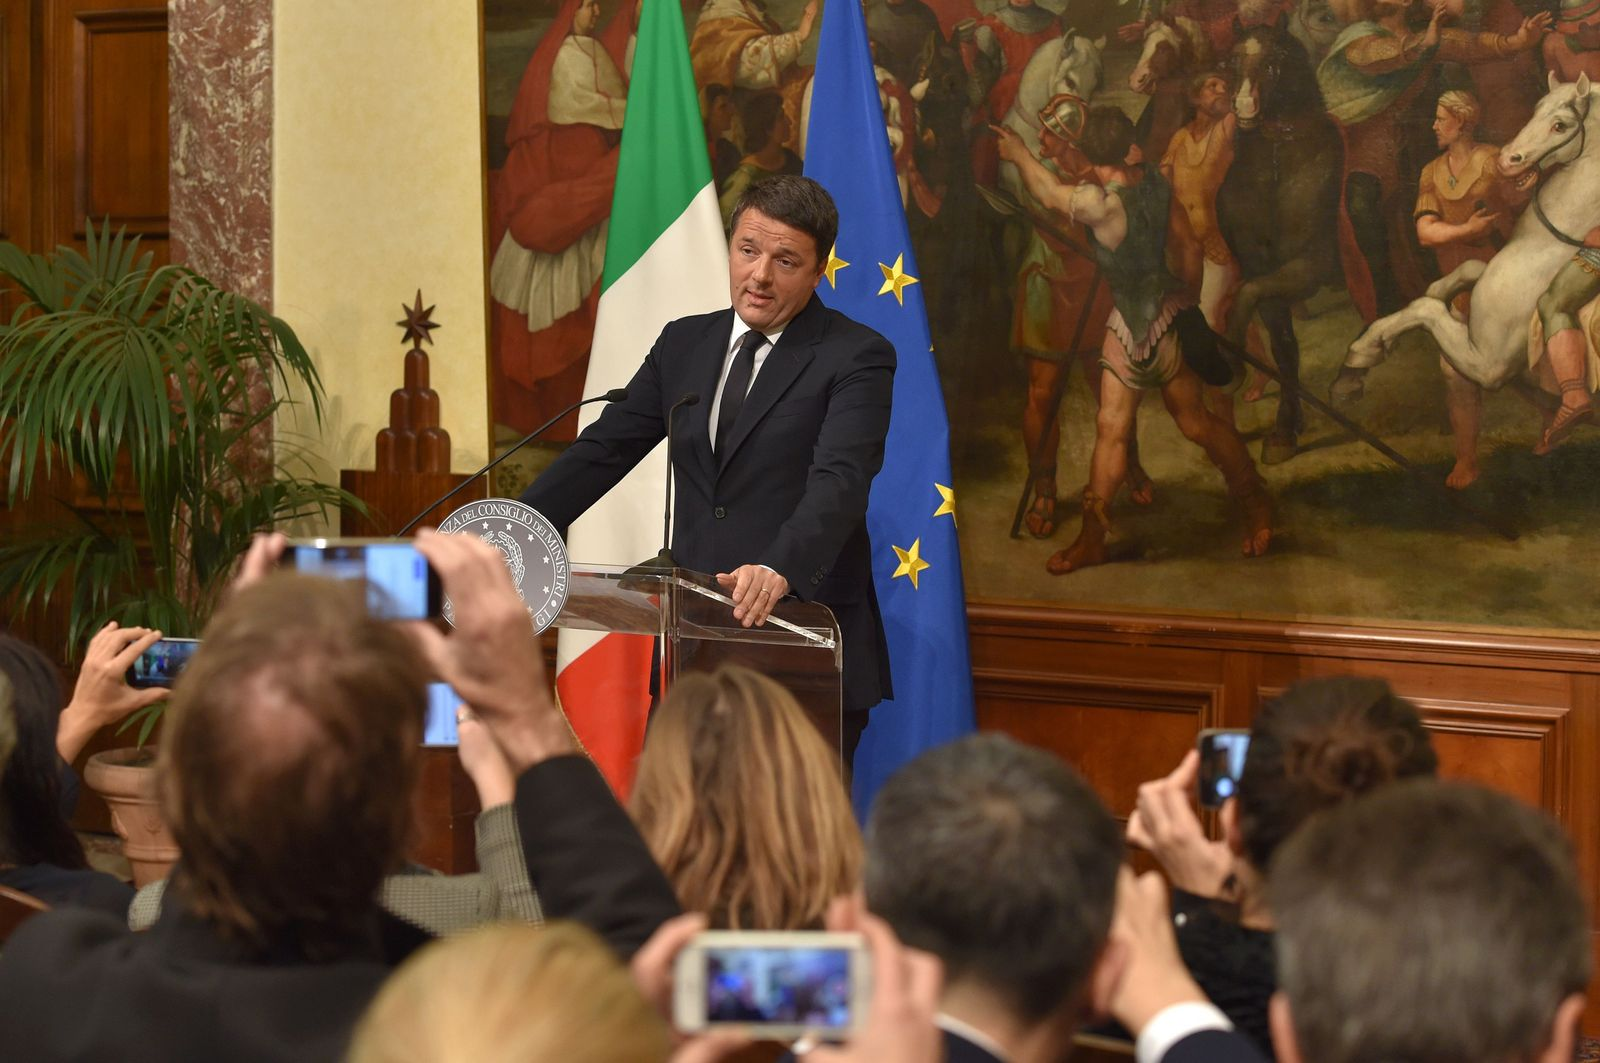 ITALY-Matteo Renzi -REFERENDUM-CONSTITUTION